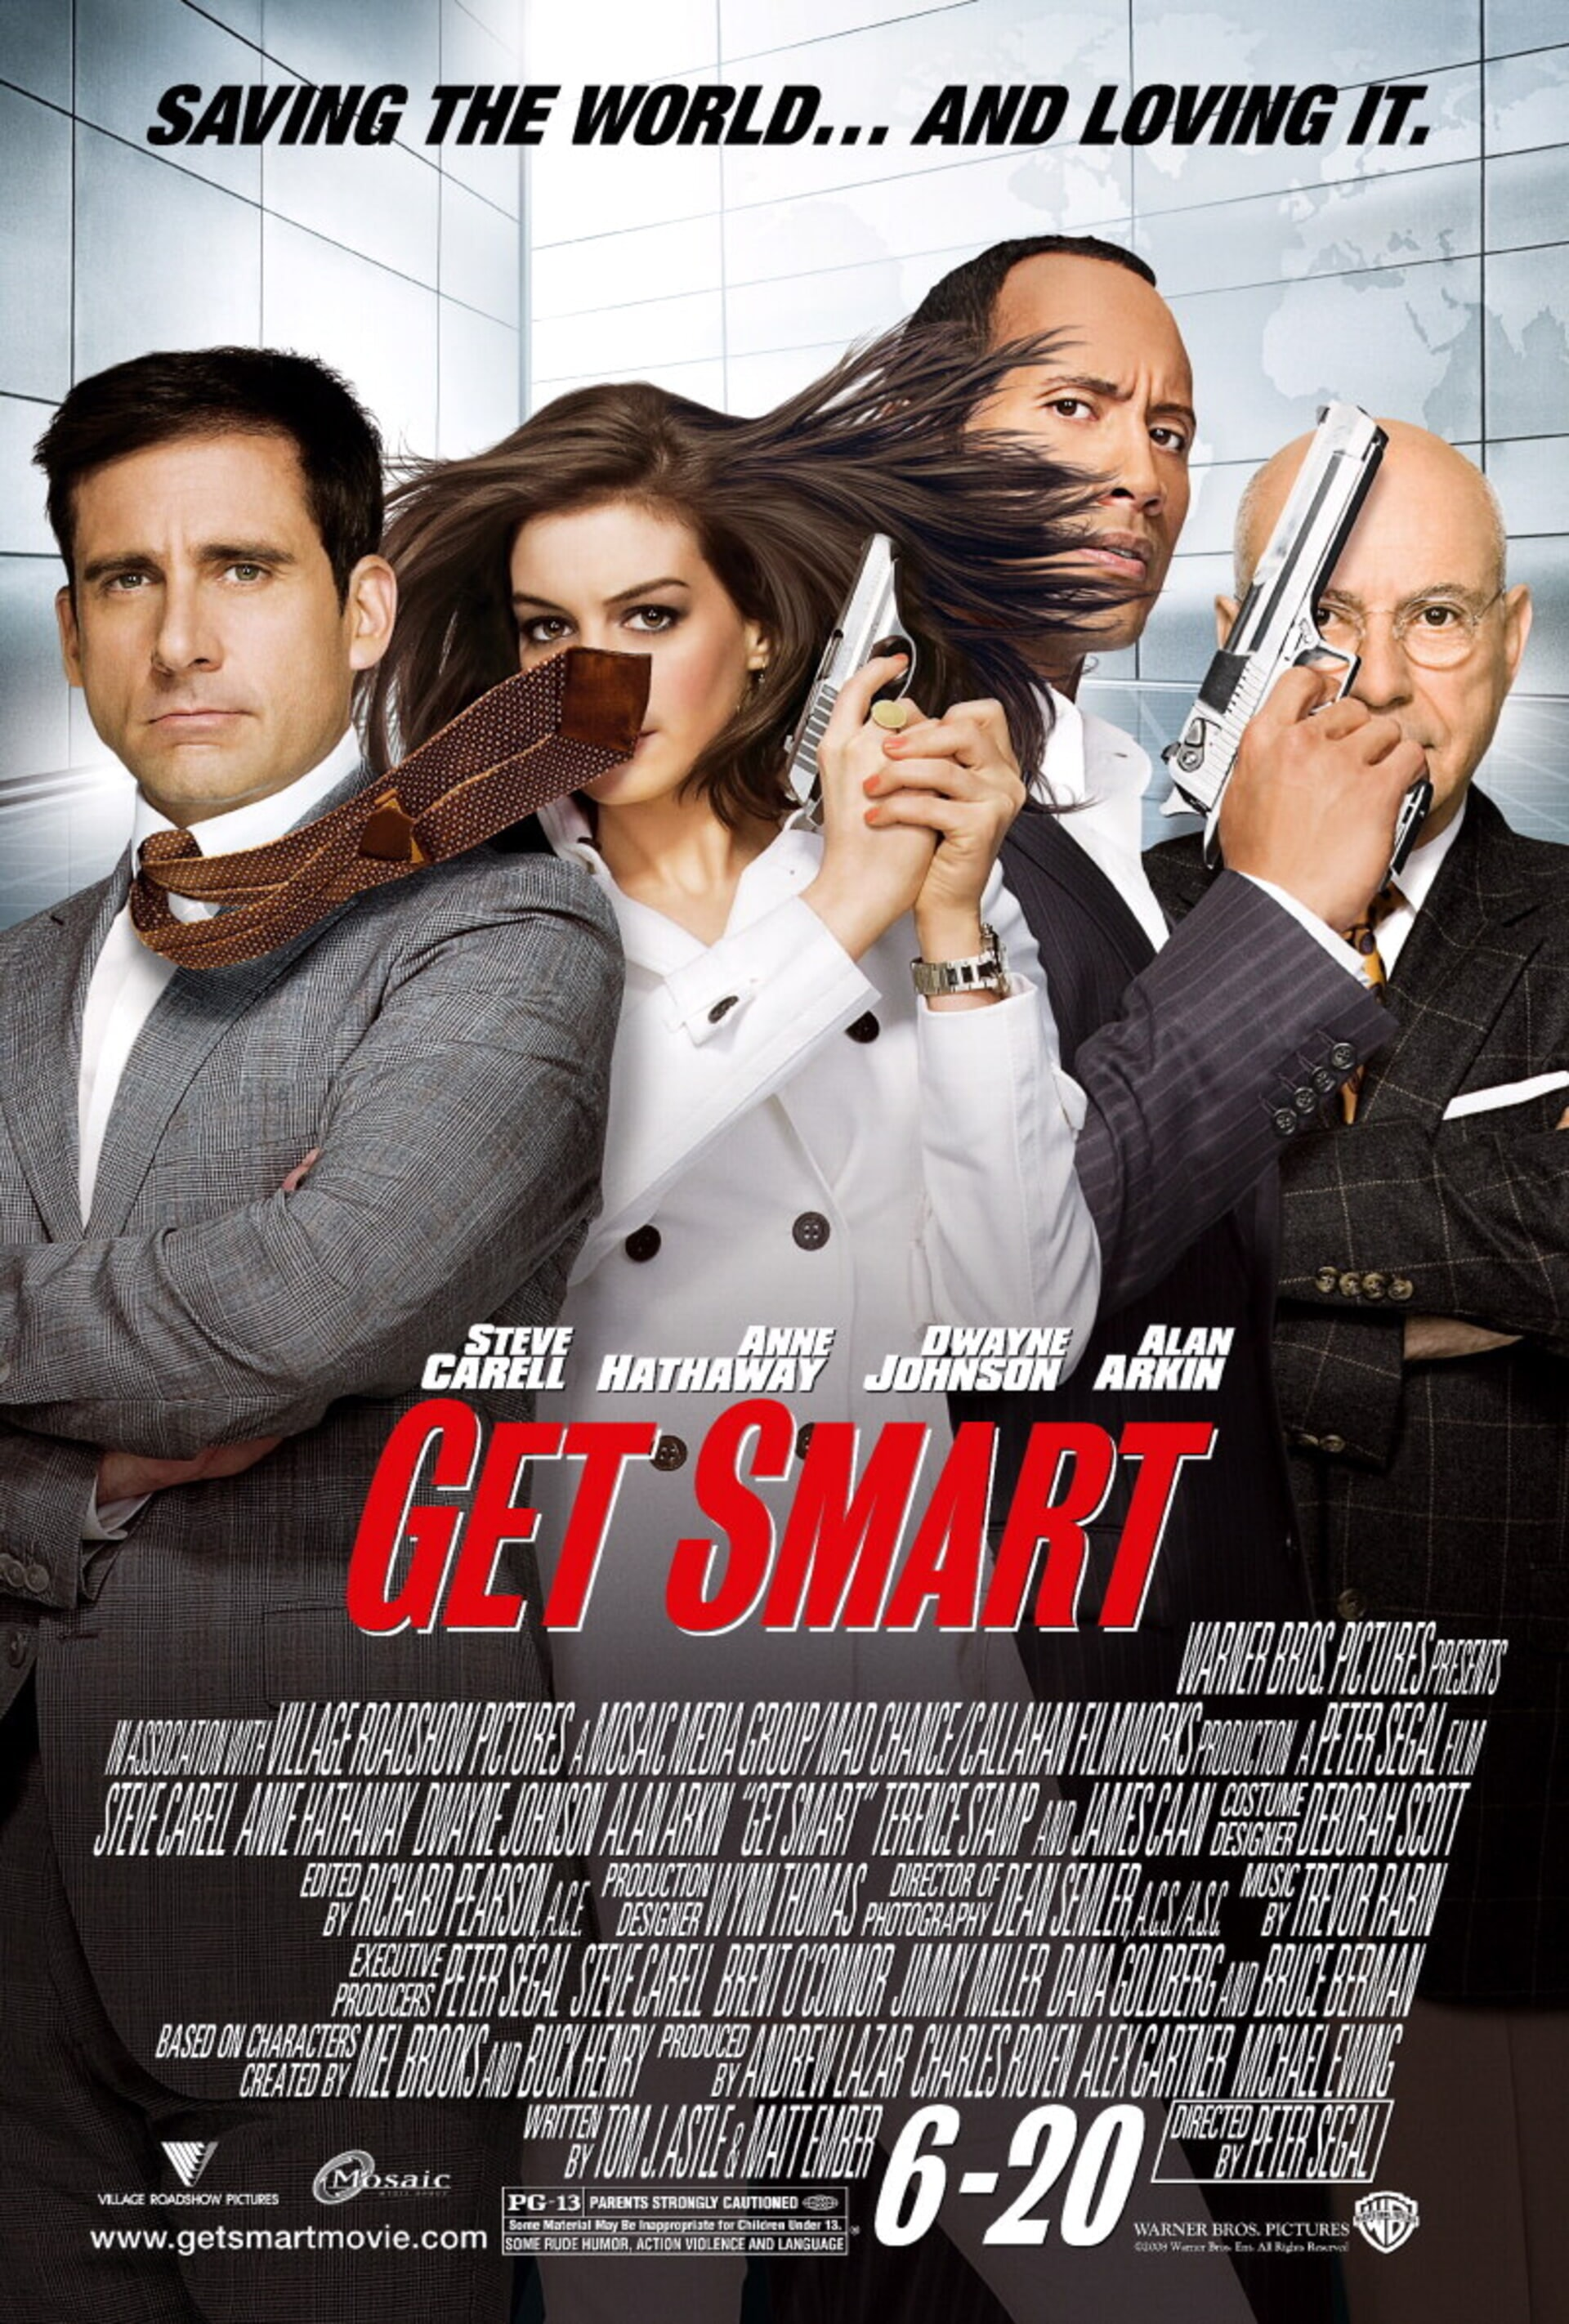 Get Smart - Poster 2